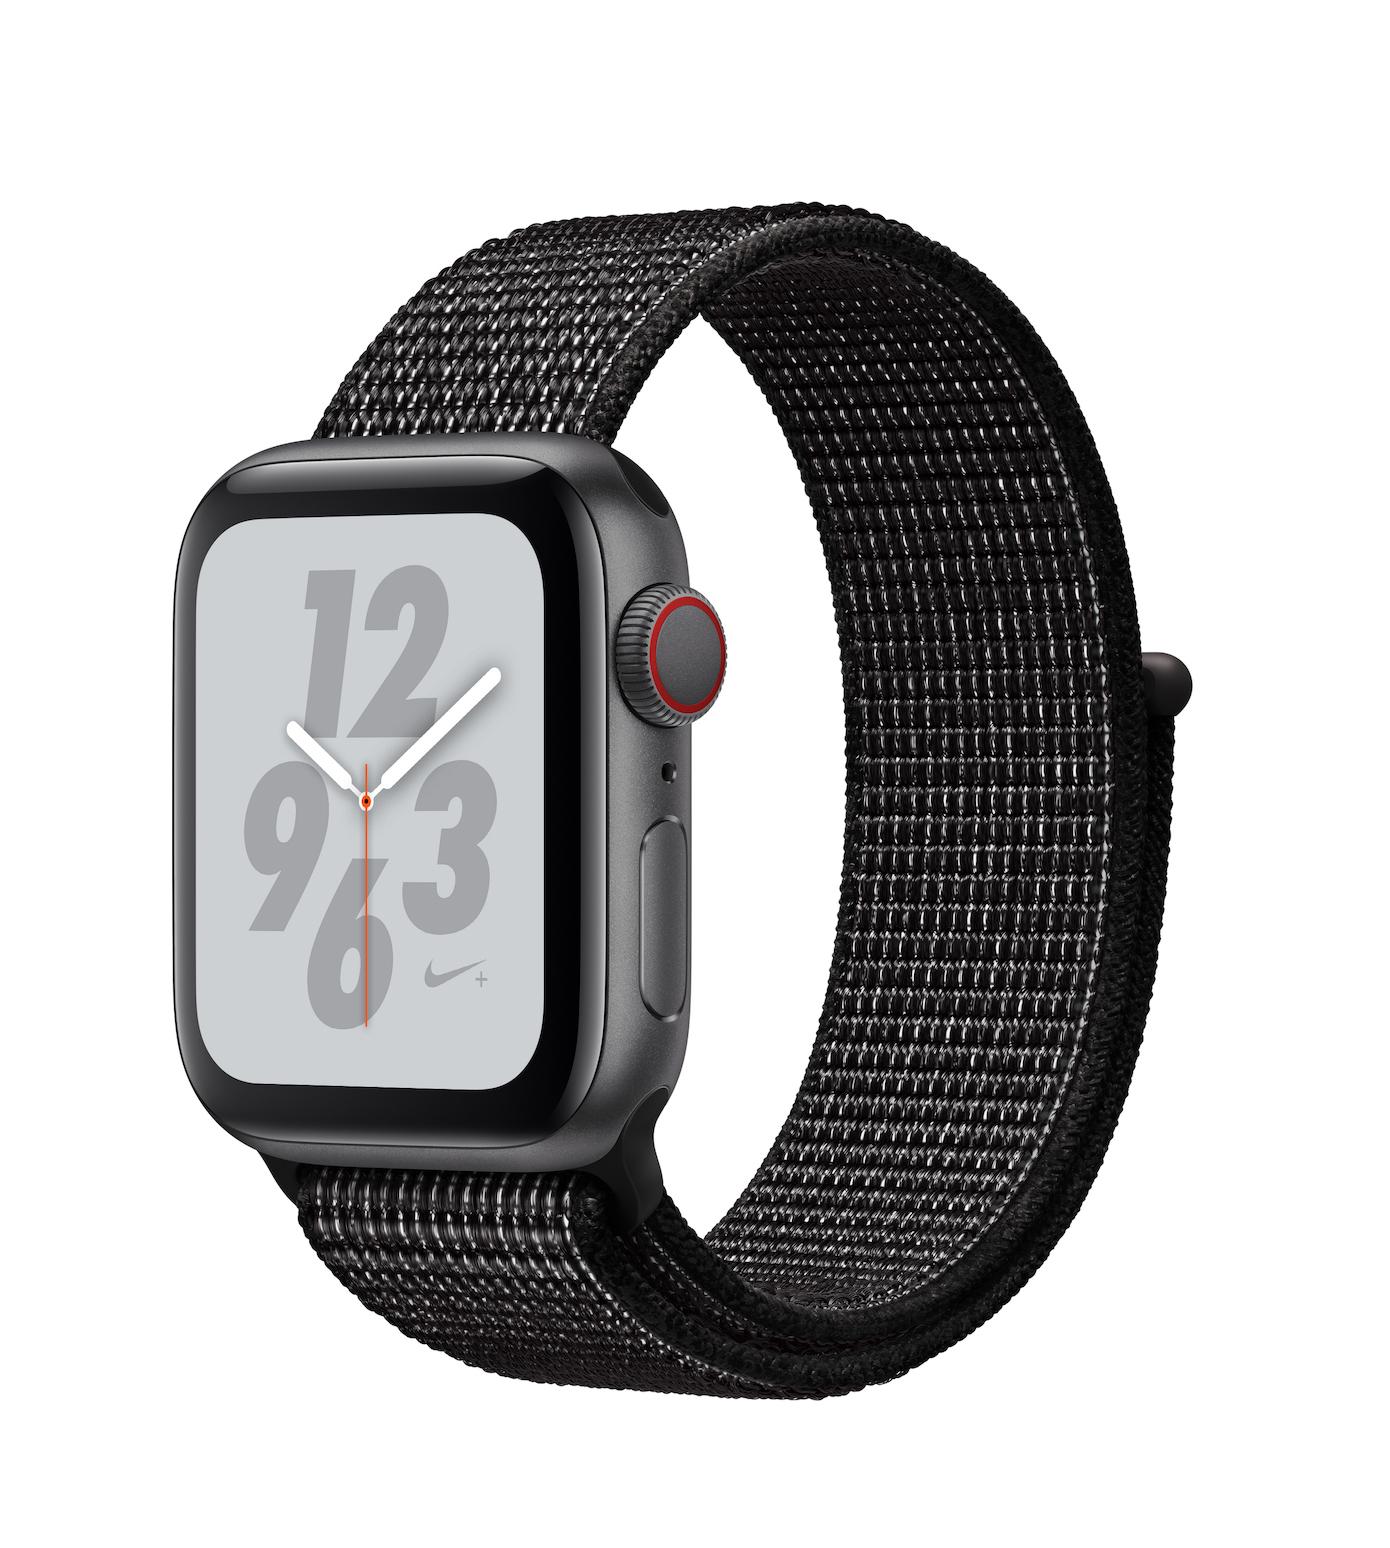 Apple Watch Series 4 Nike+ 44mm Aluminium Space Grey Sport Loop MU7J2 Πληρωμή έως 24 δόσεις